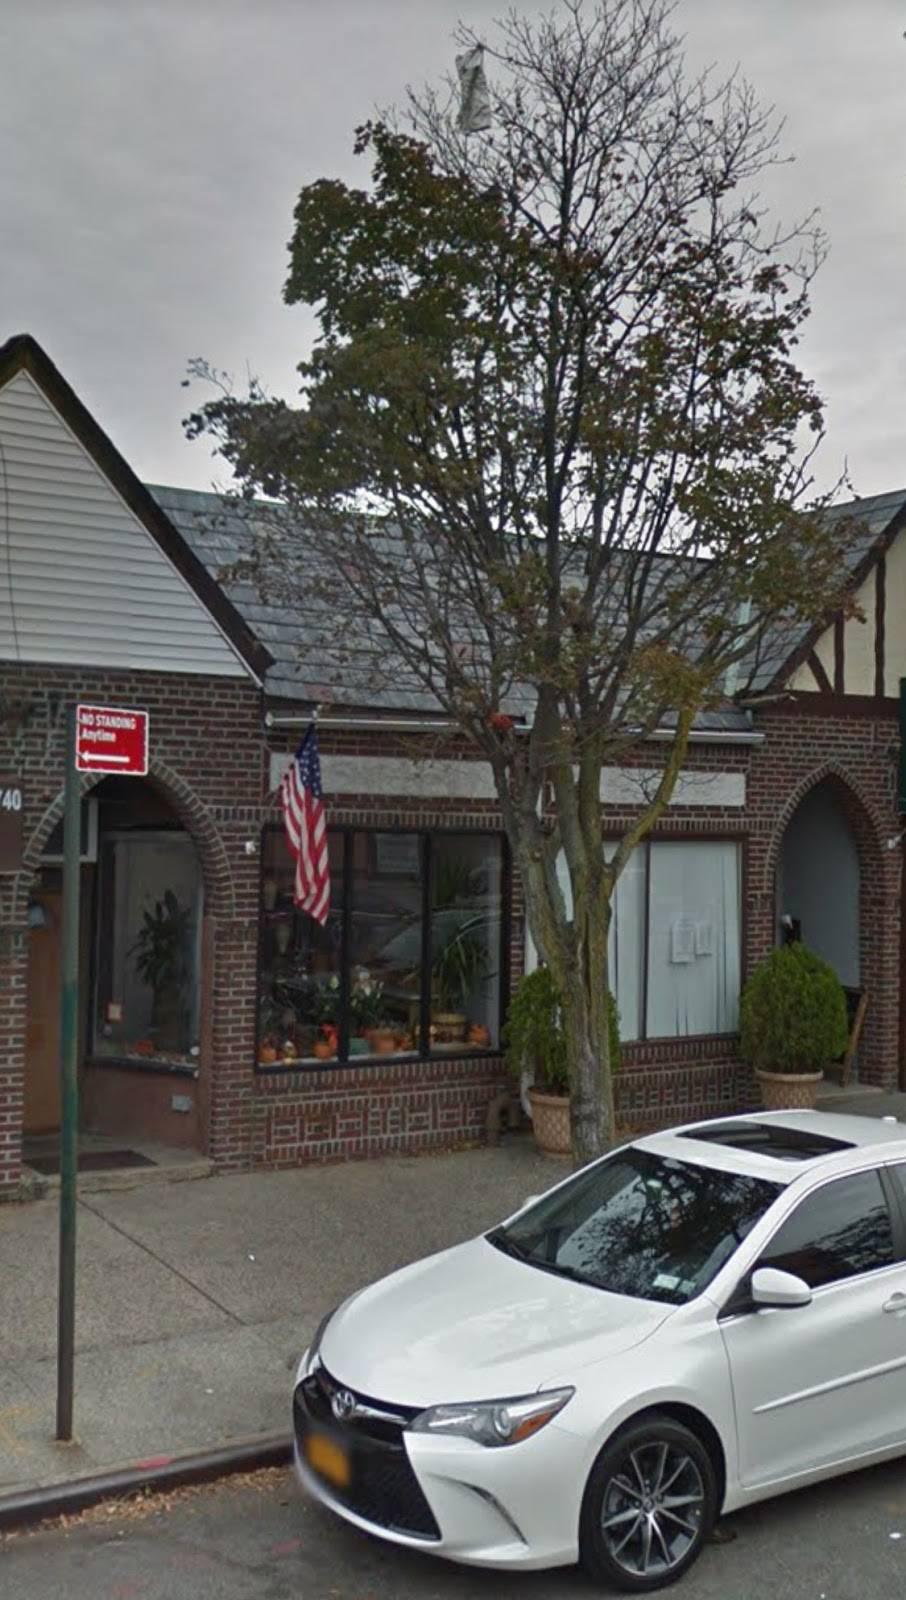 Associazione Sportiva Italiana di New York   restaurant   73-07 88th St, Ridgewood, NY 11385, USA   7182085994 OR +1 718-208-5994